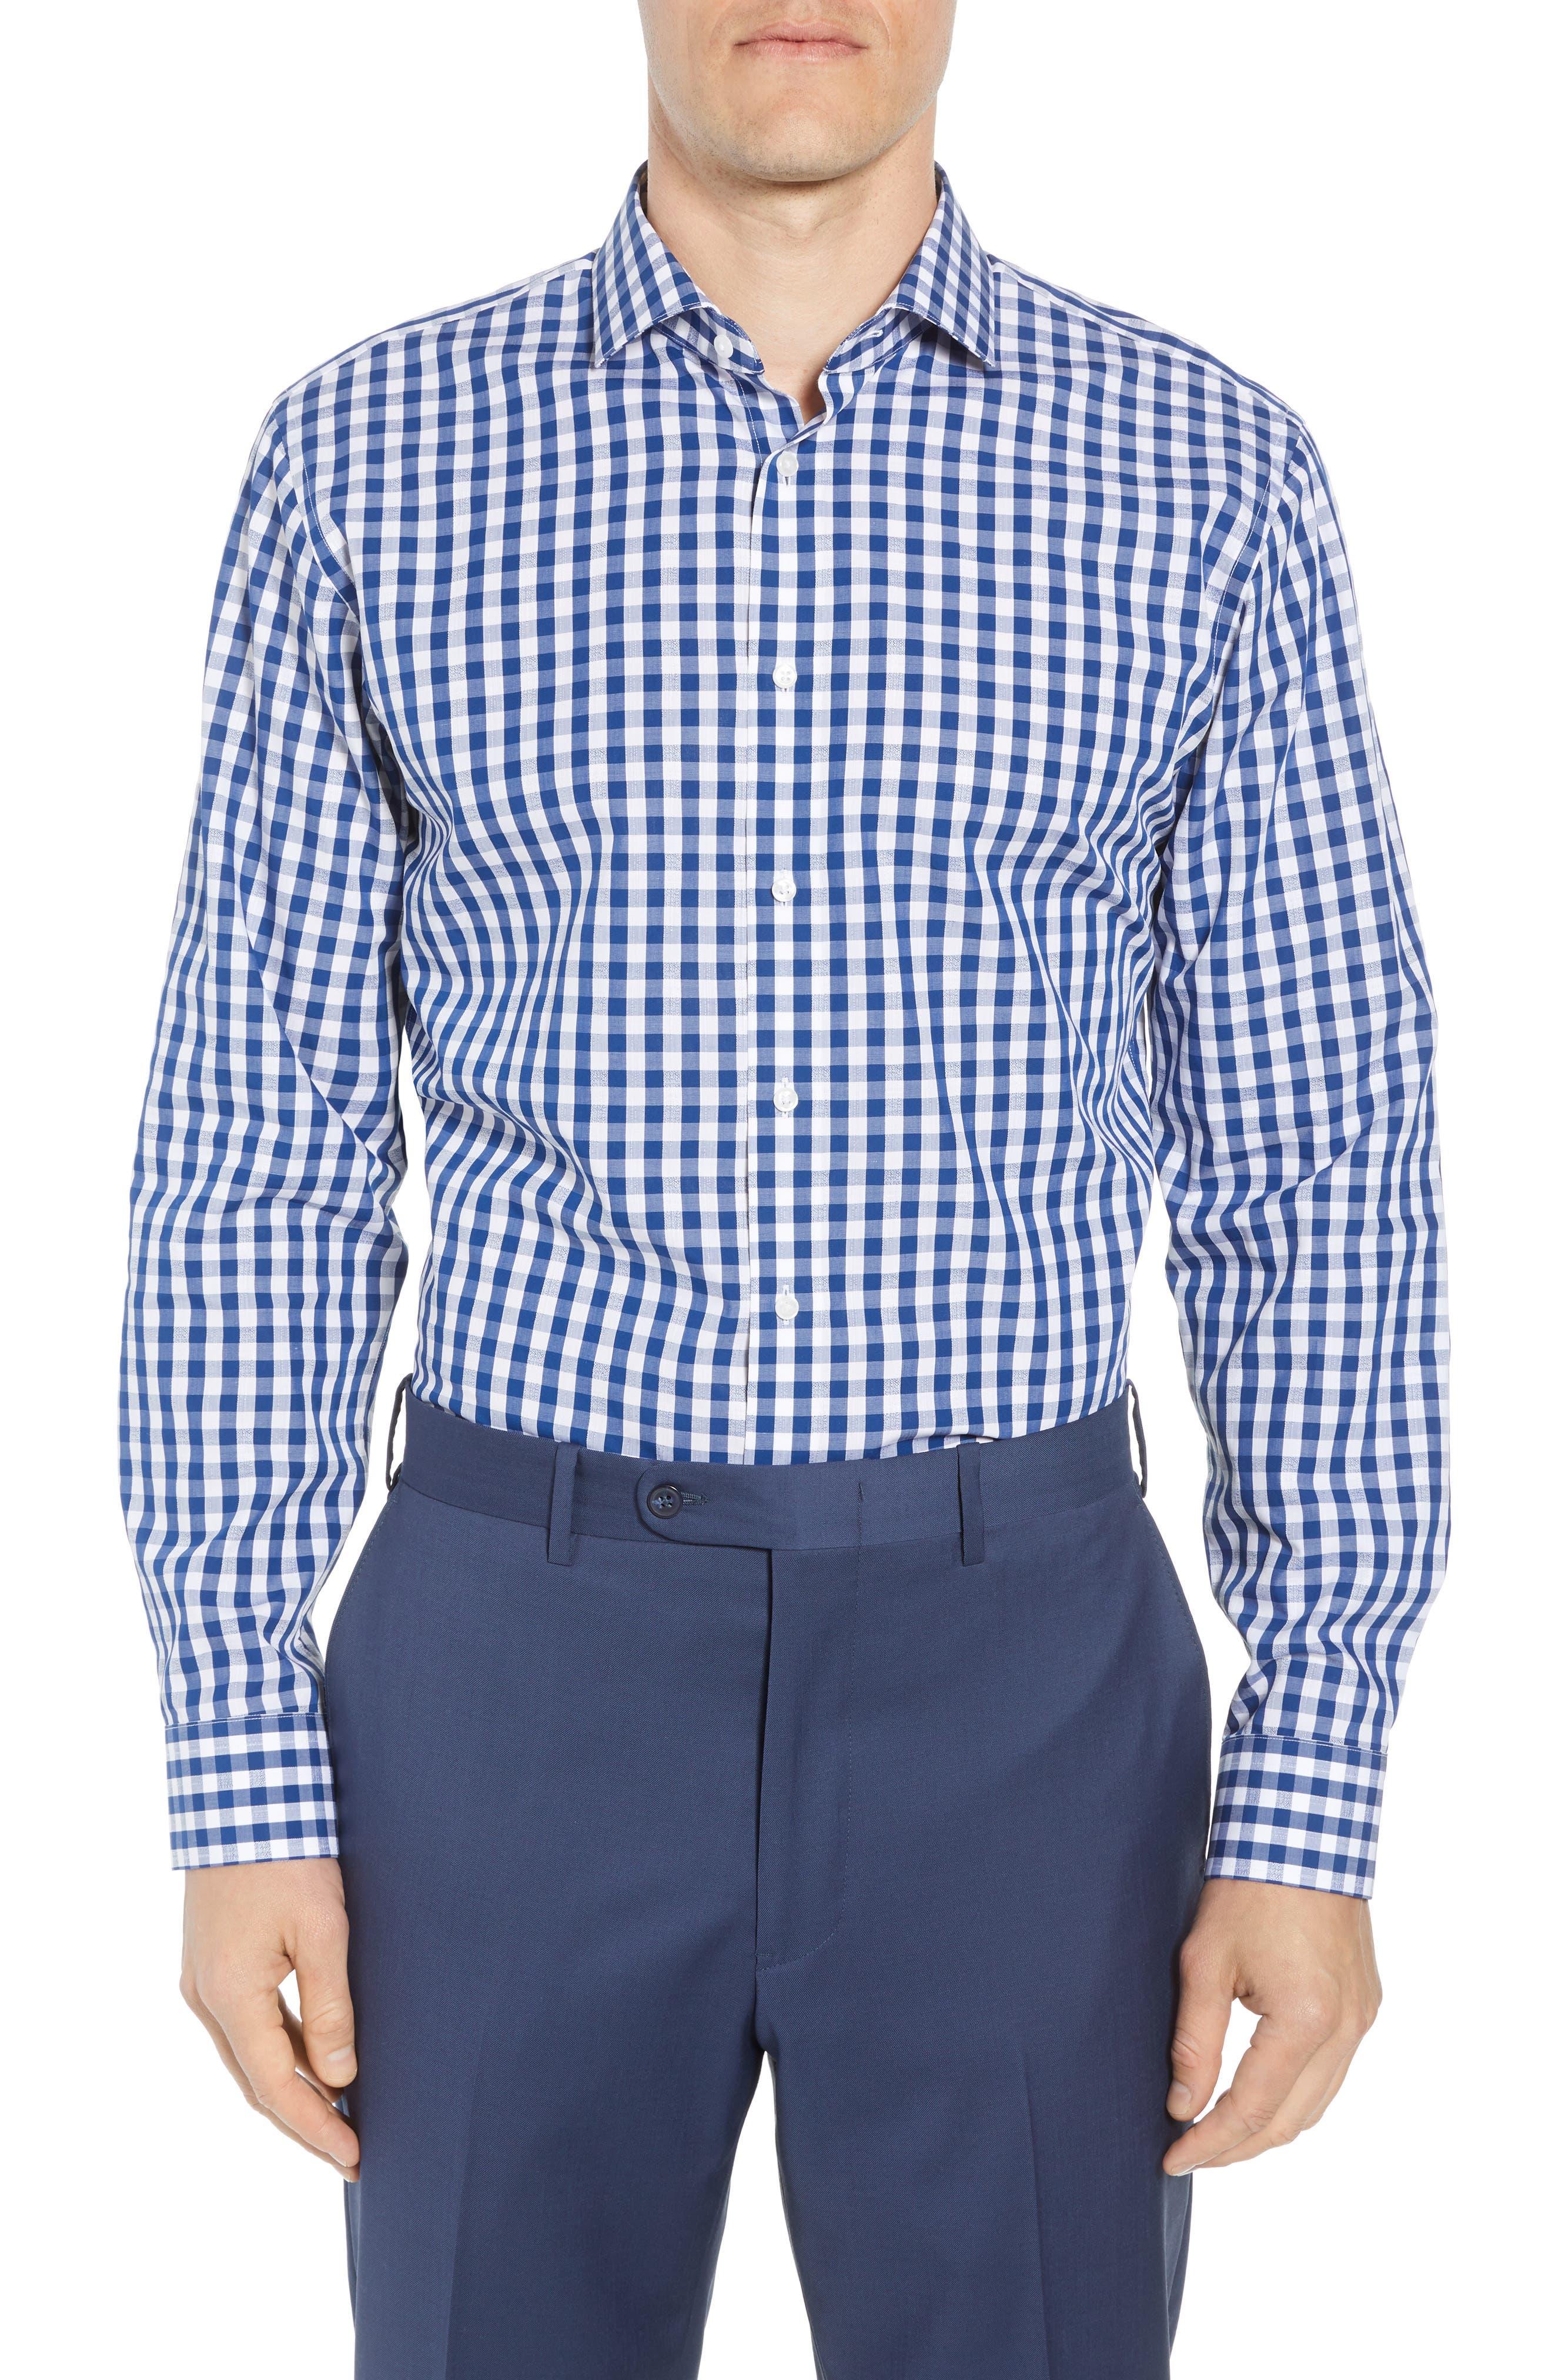 Trim Fit Check Dress Shirt,                             Main thumbnail 1, color,                             Blue Caspia